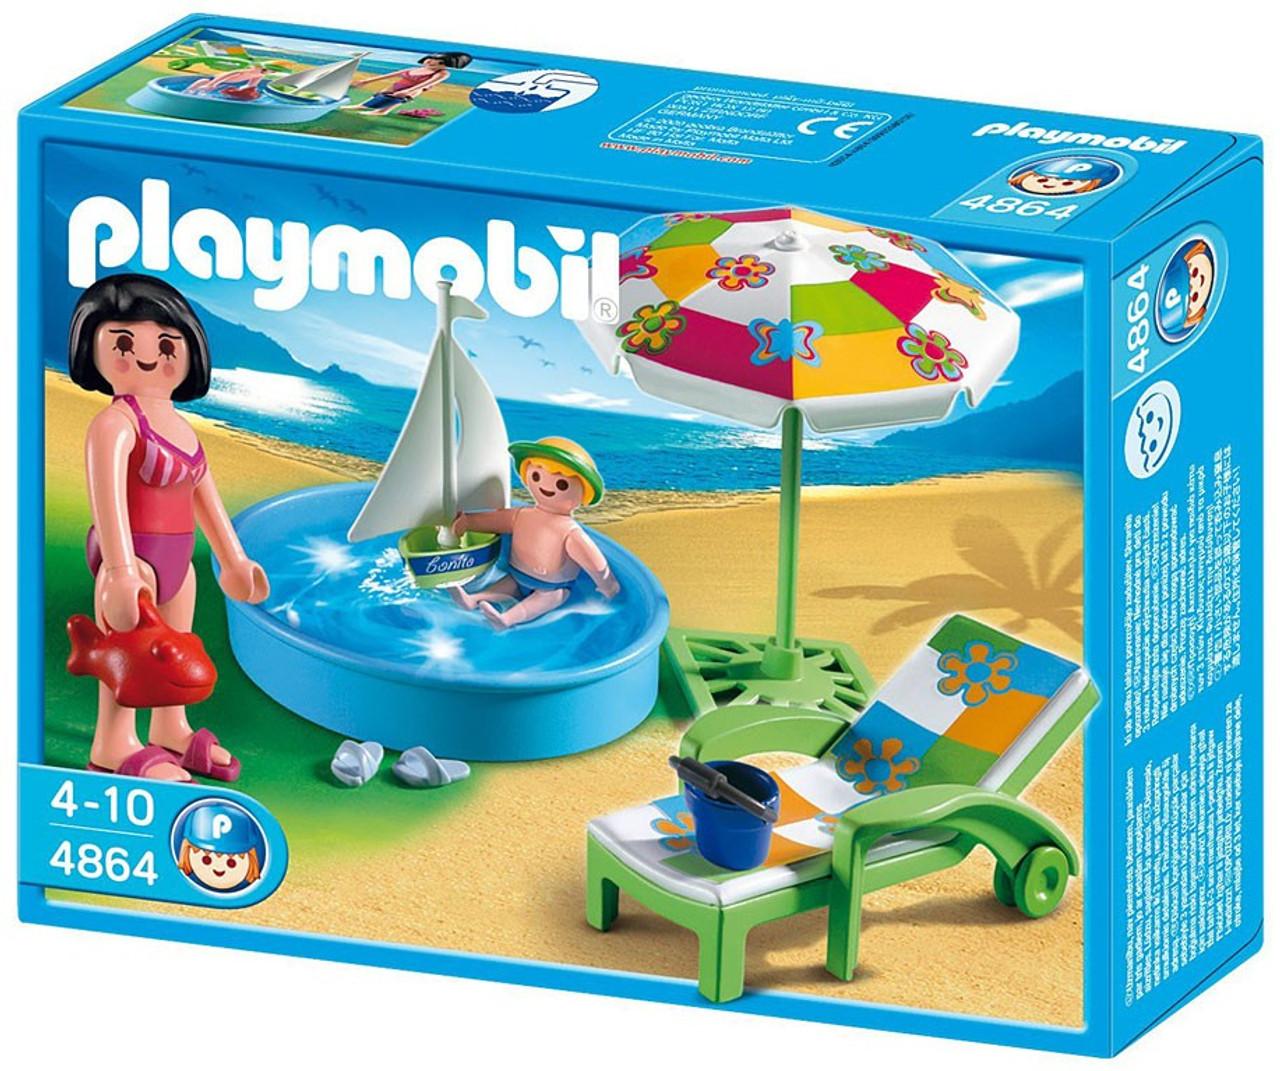 Playmobil Vacation & Leisure Paddling Pool Set #4864